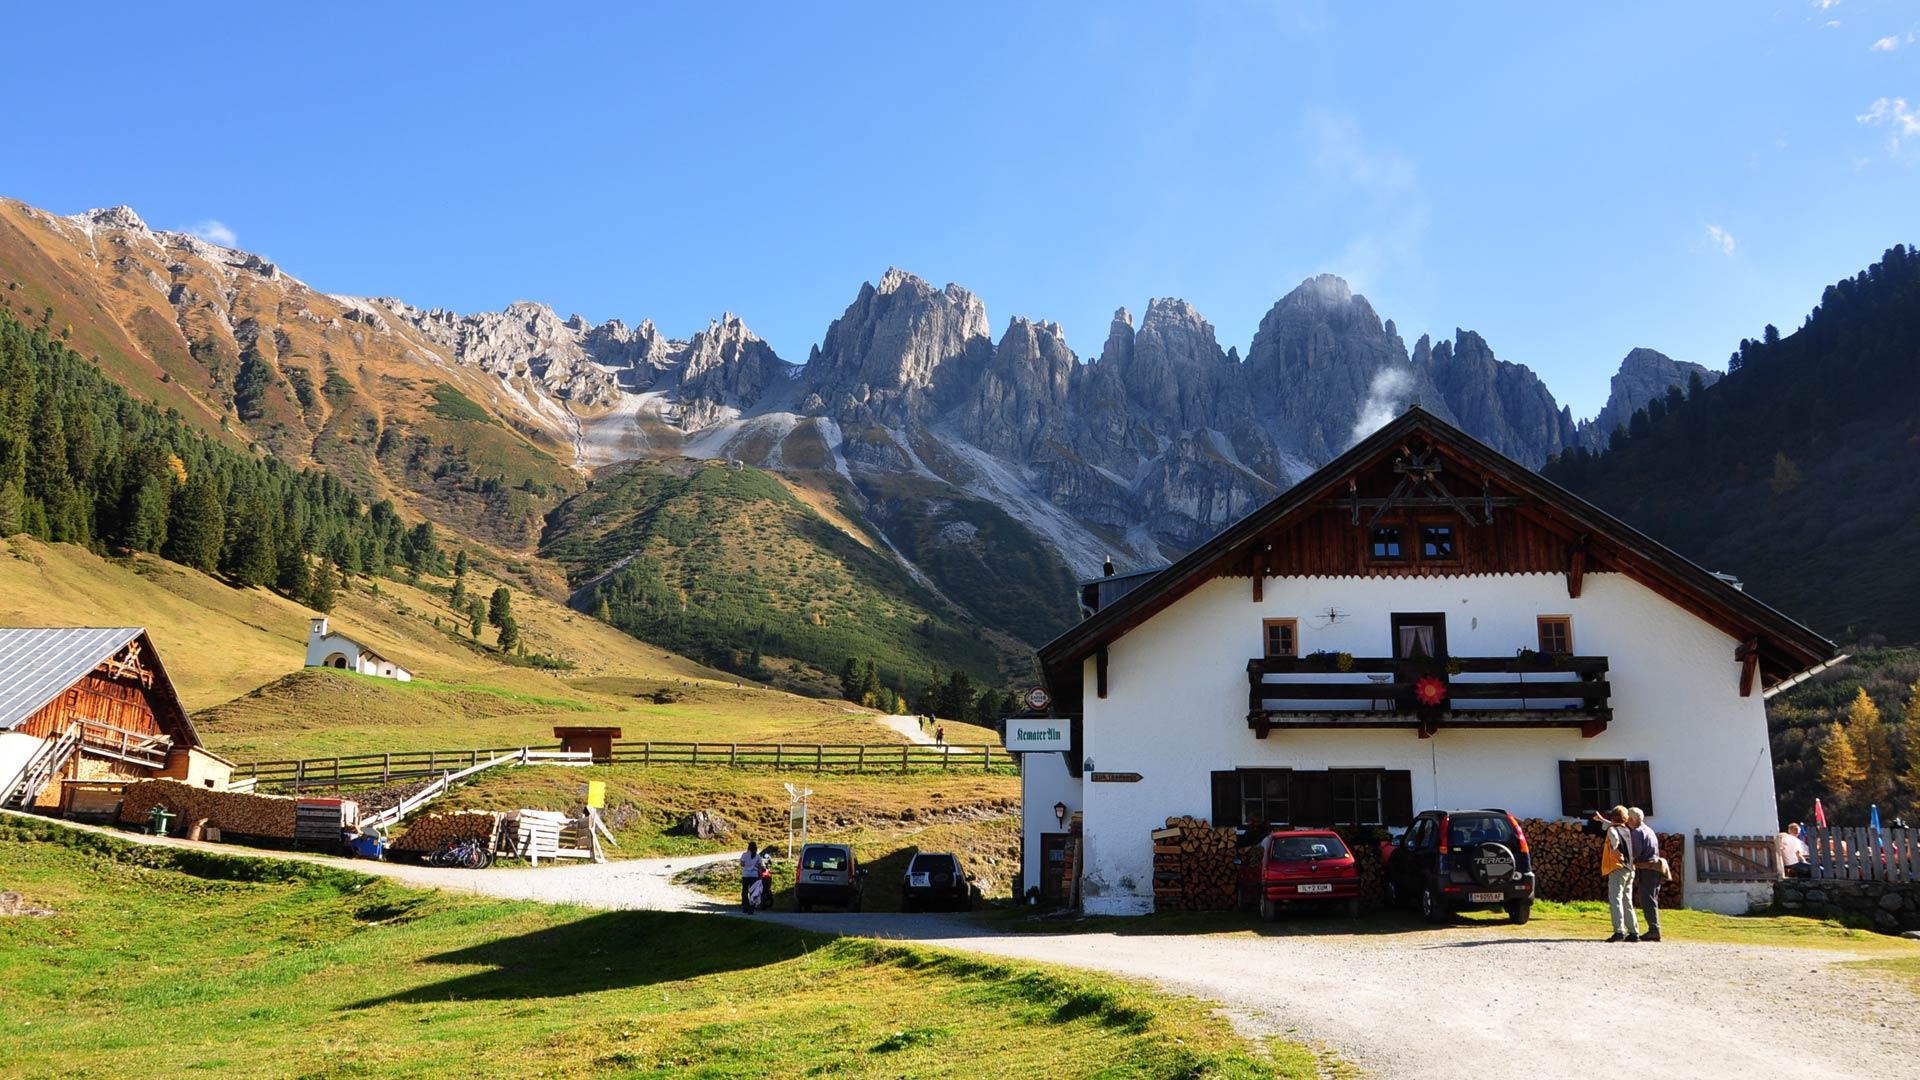 Klettersteigset Innsbruck : Innsbrucker klettersteig vordere brandjochspitze m